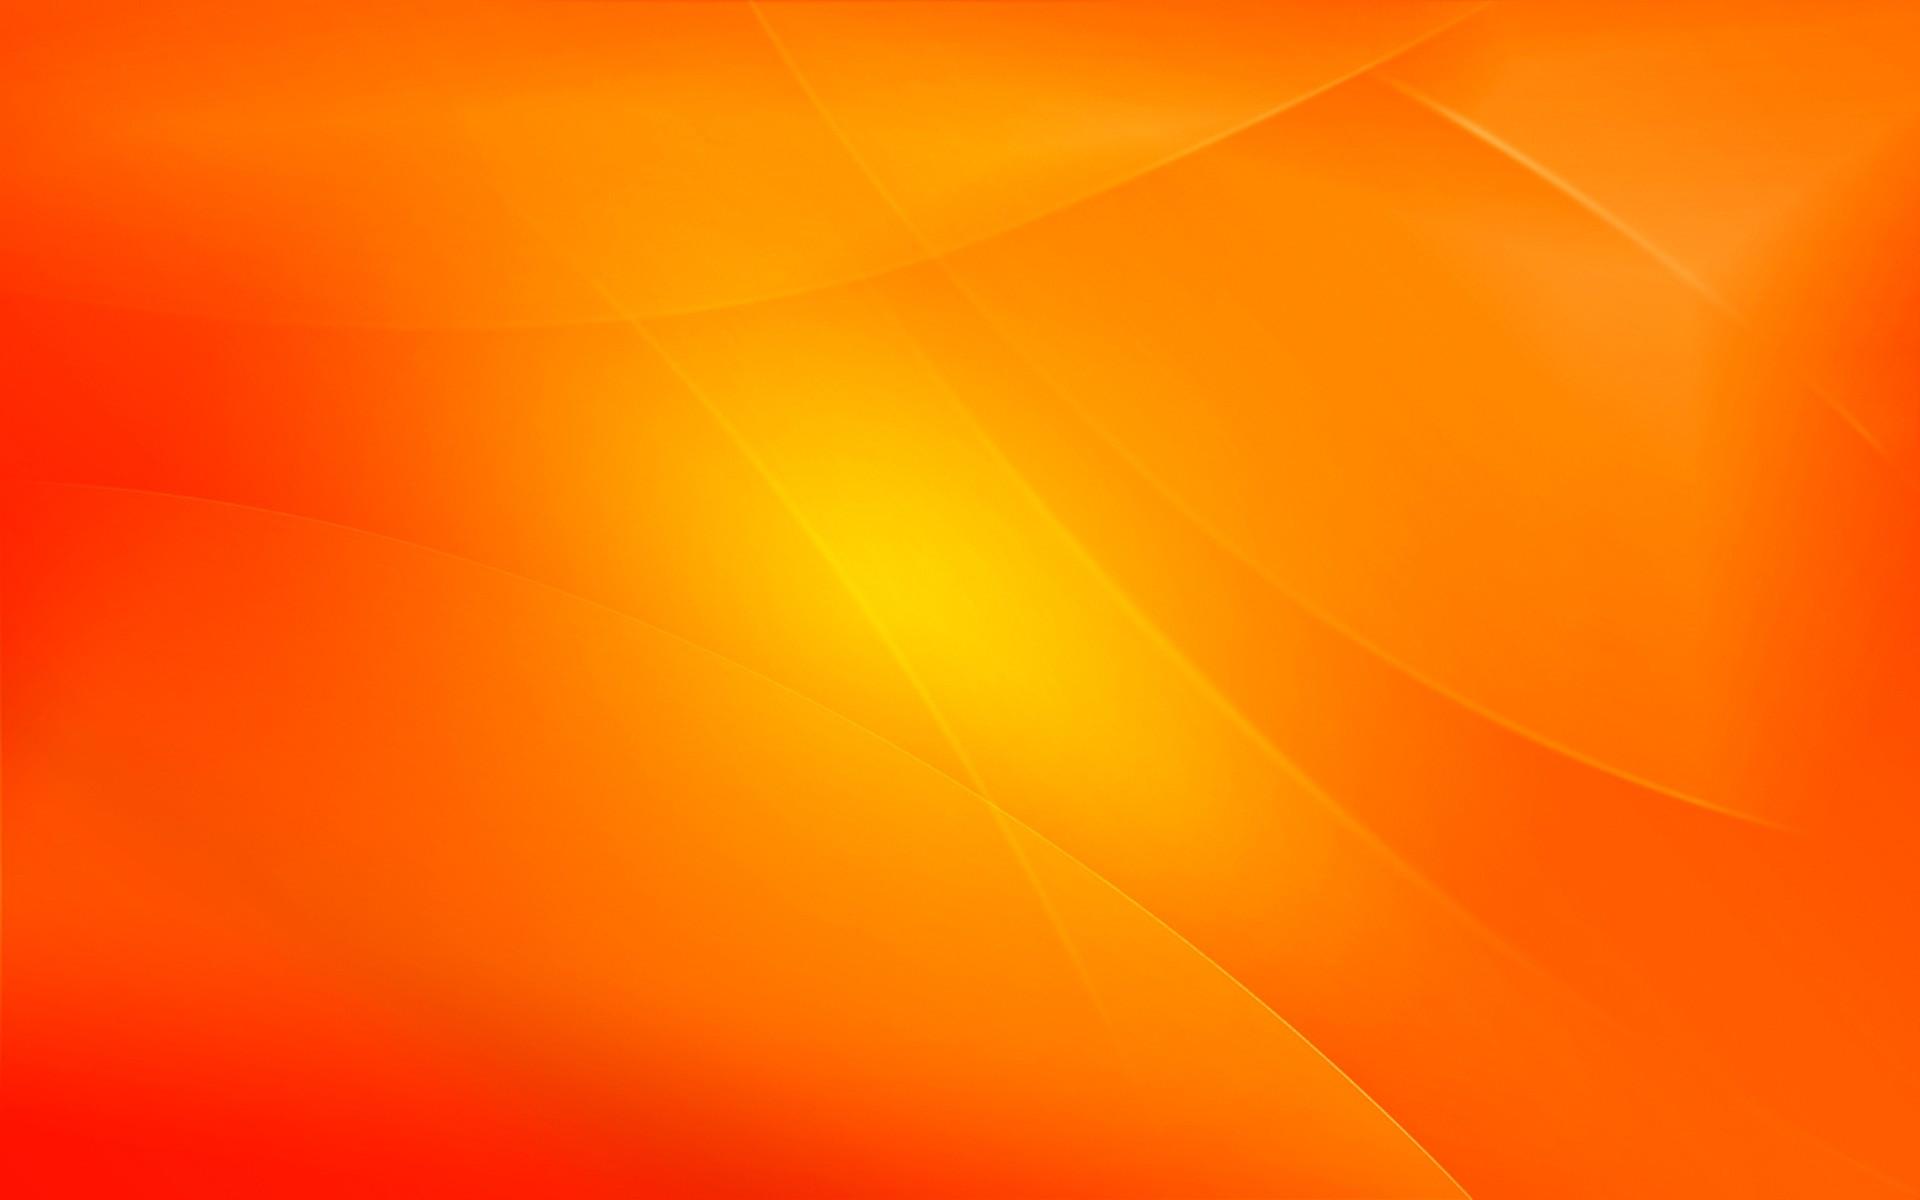 HD Orange Wallpapers Download   864141 1920x1200